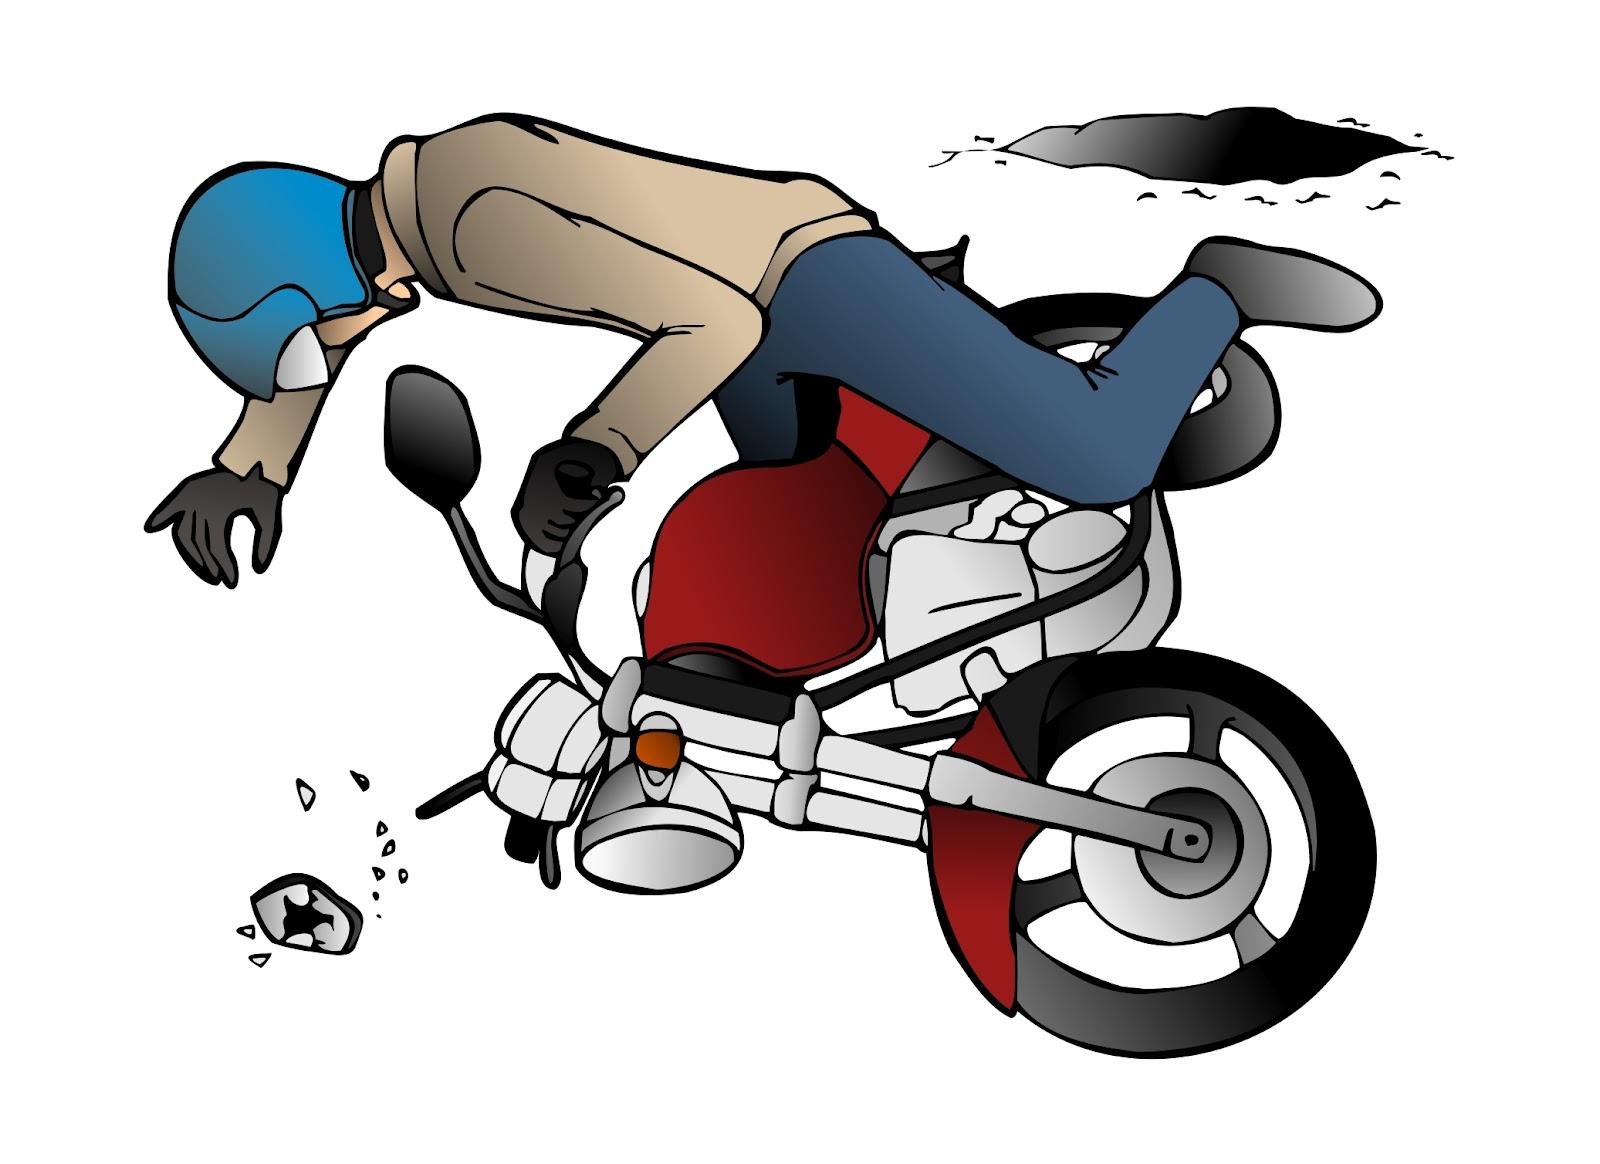 Gambar Kartun Tabrakan Motor Galeriotto